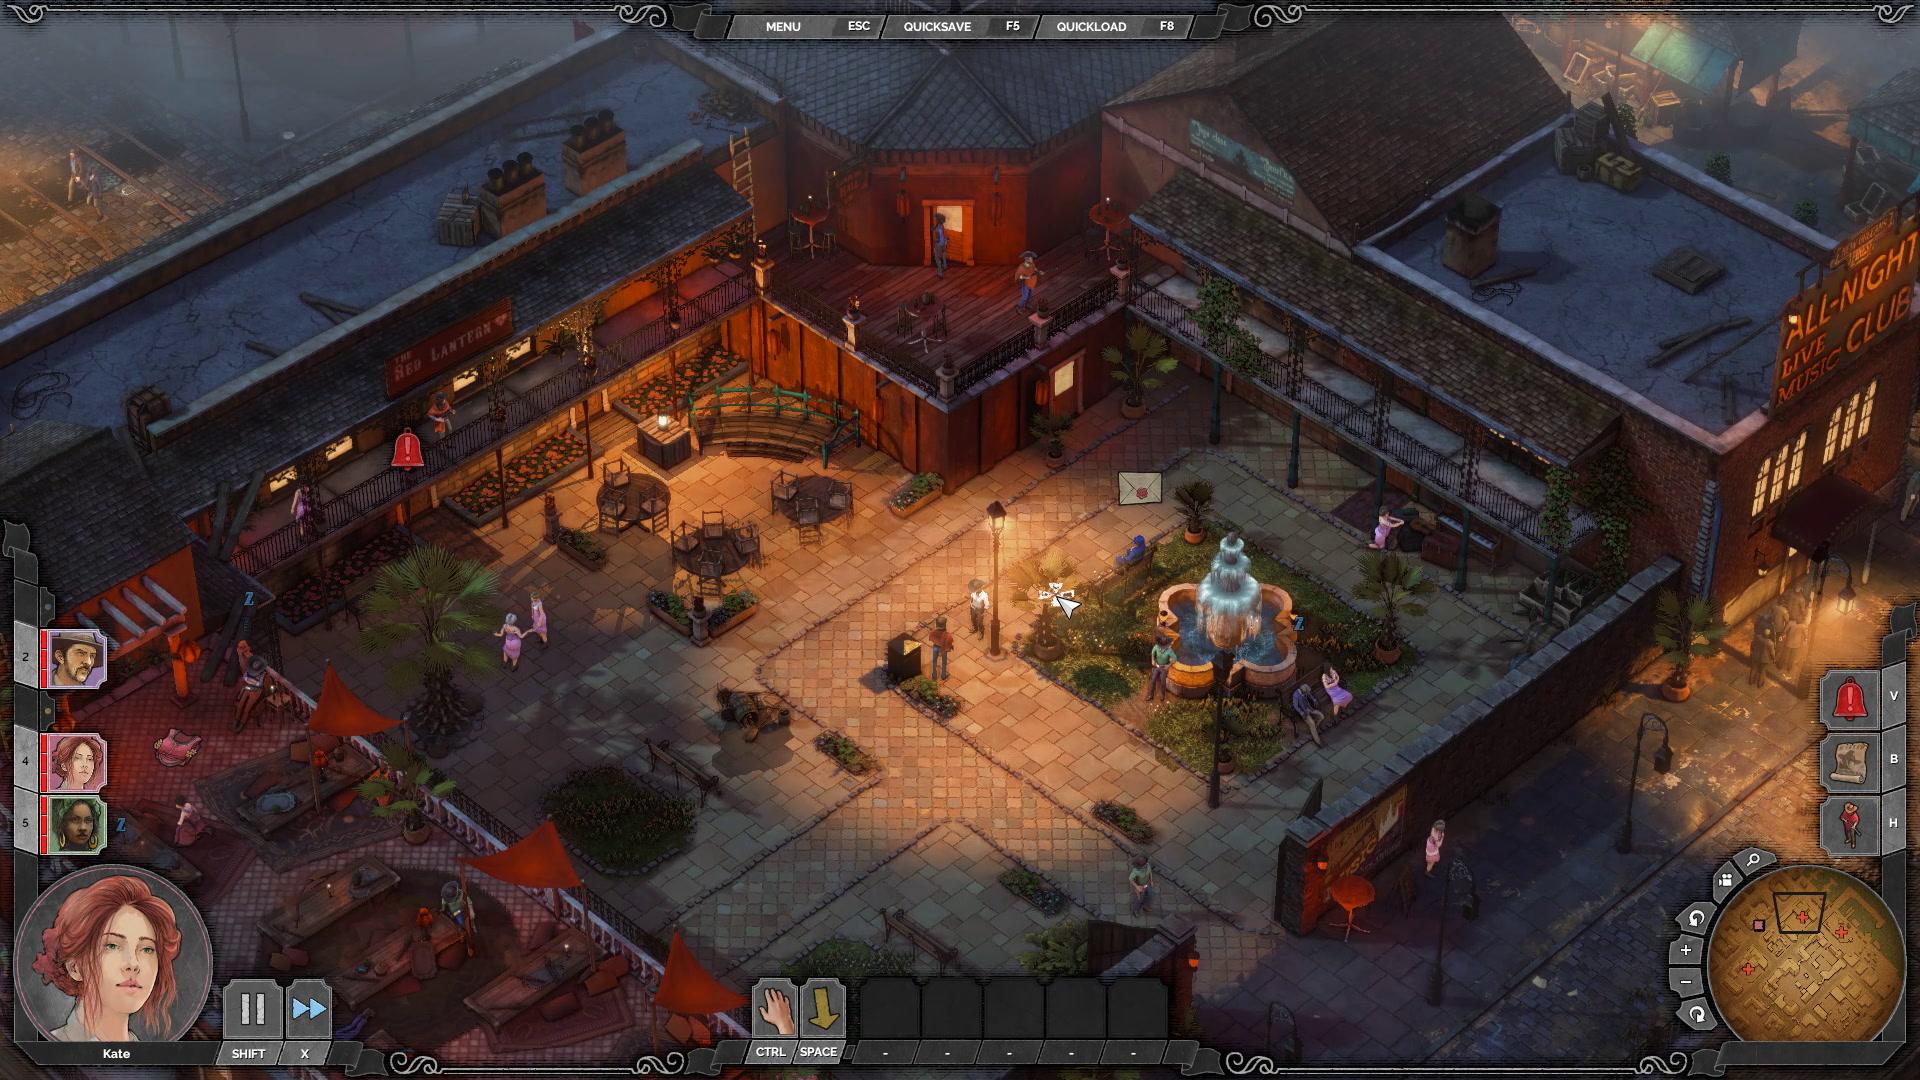 Desperados Iii Review Sneak Or Blast Through Wild West Dioramas